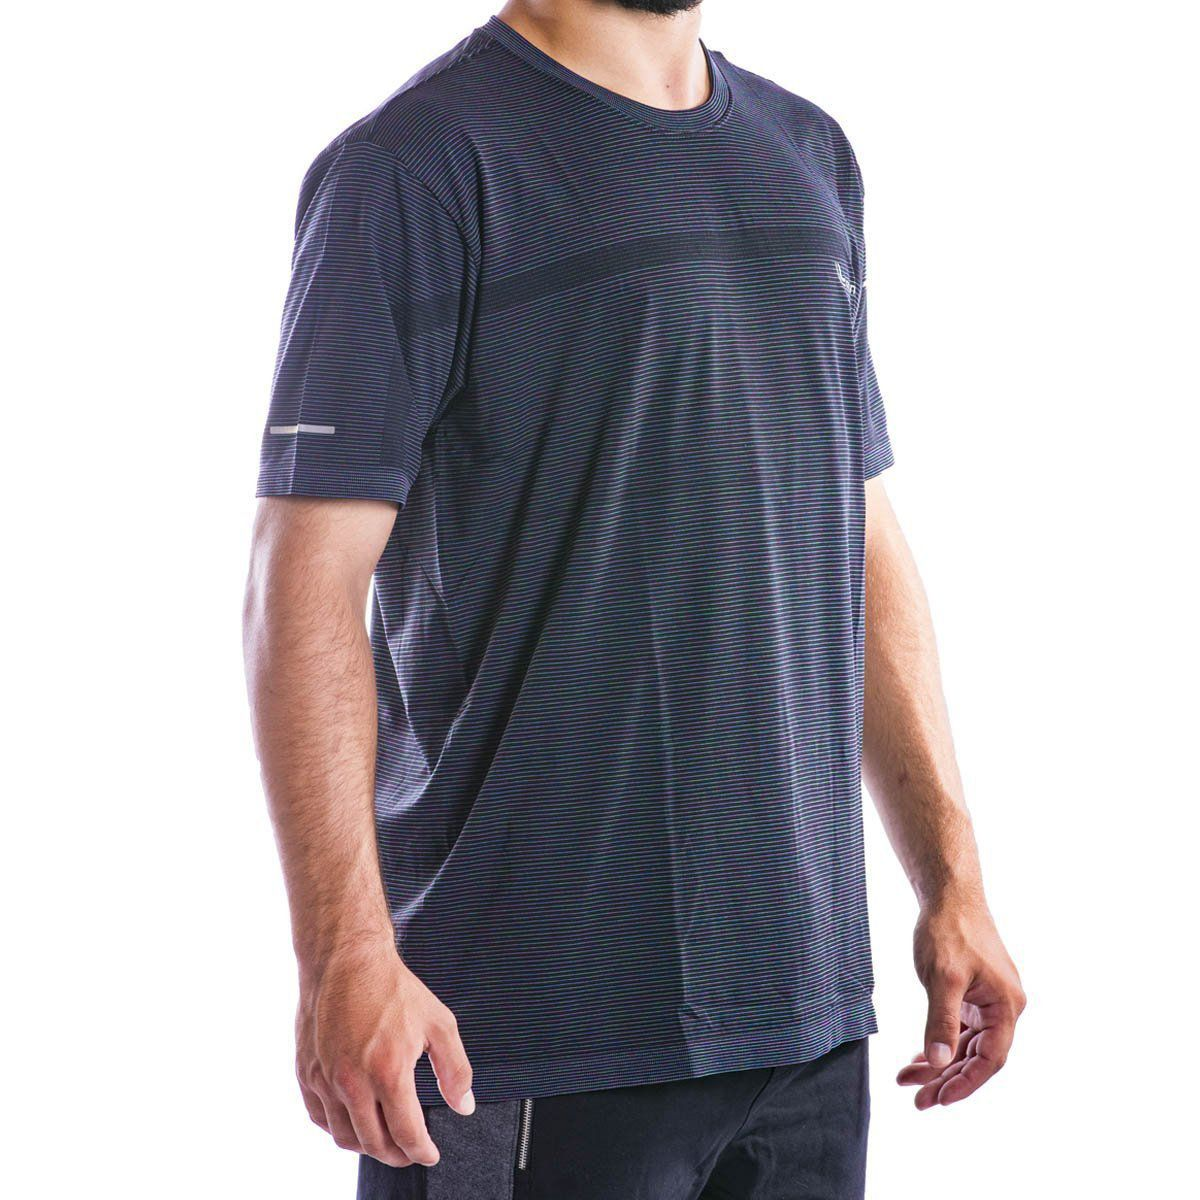 Camiseta Lupo Masculina - T Shirt Tri Listras -